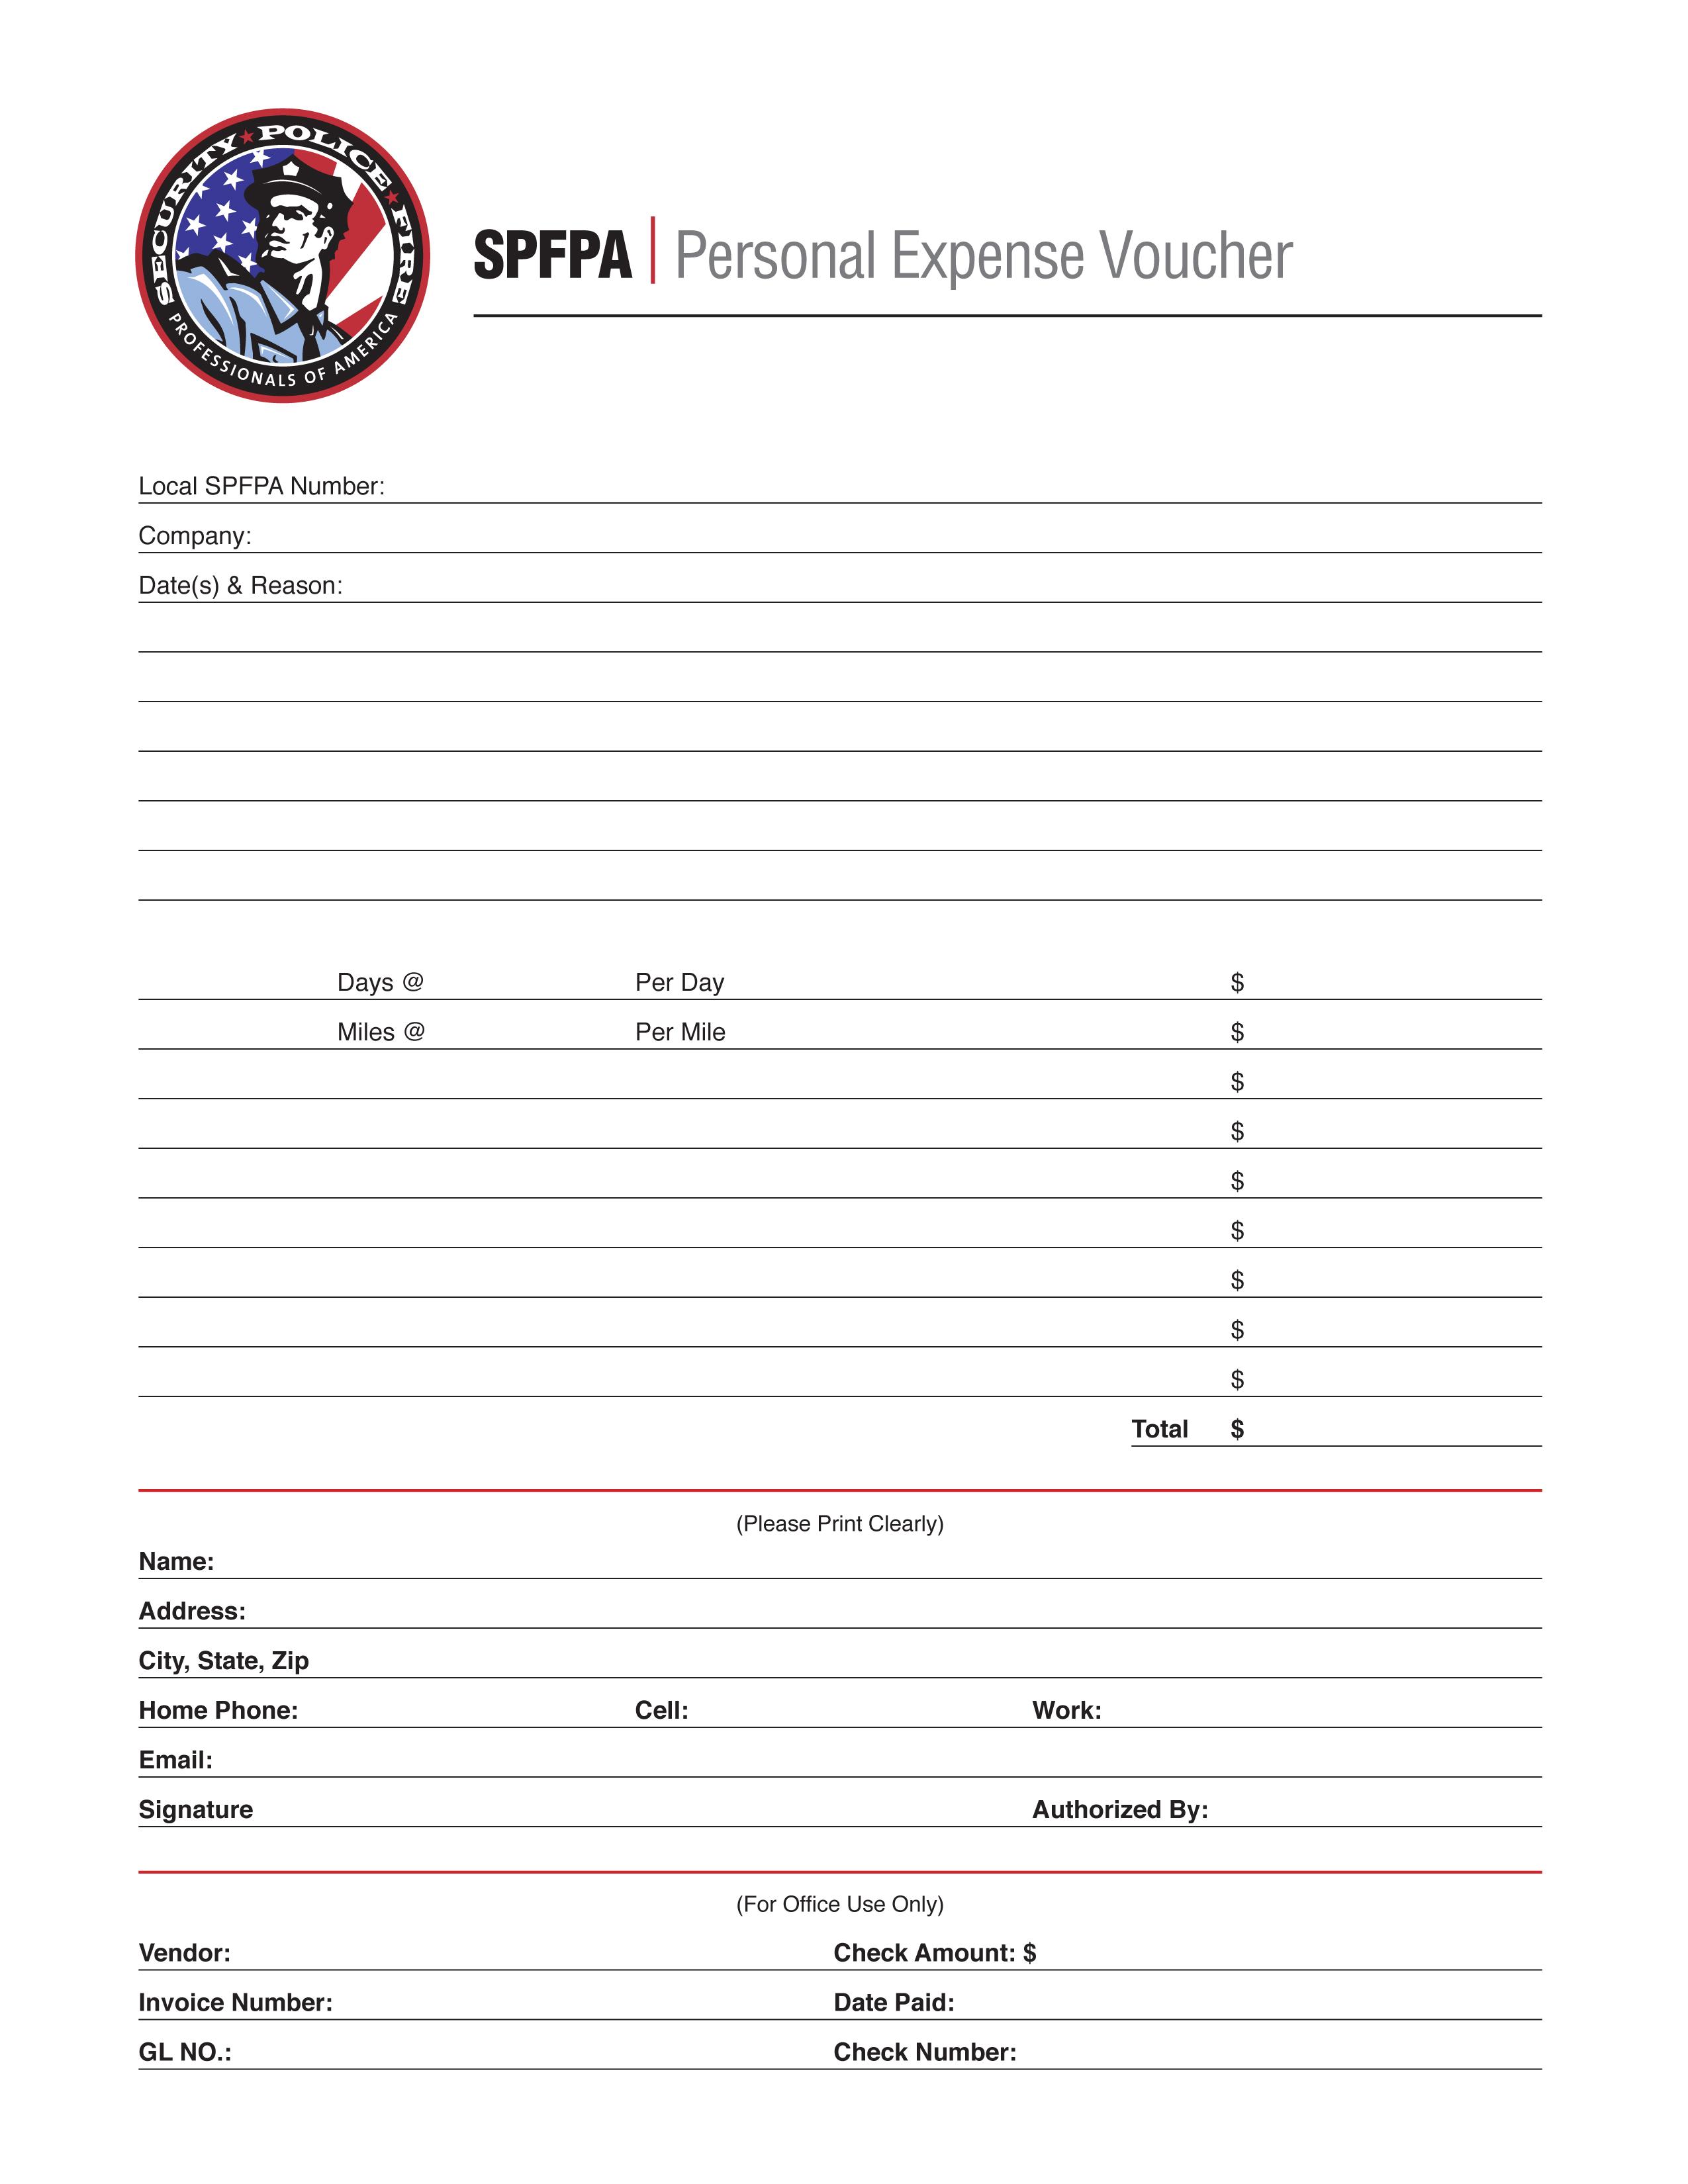 SPFPA– Personal Expense Voucher